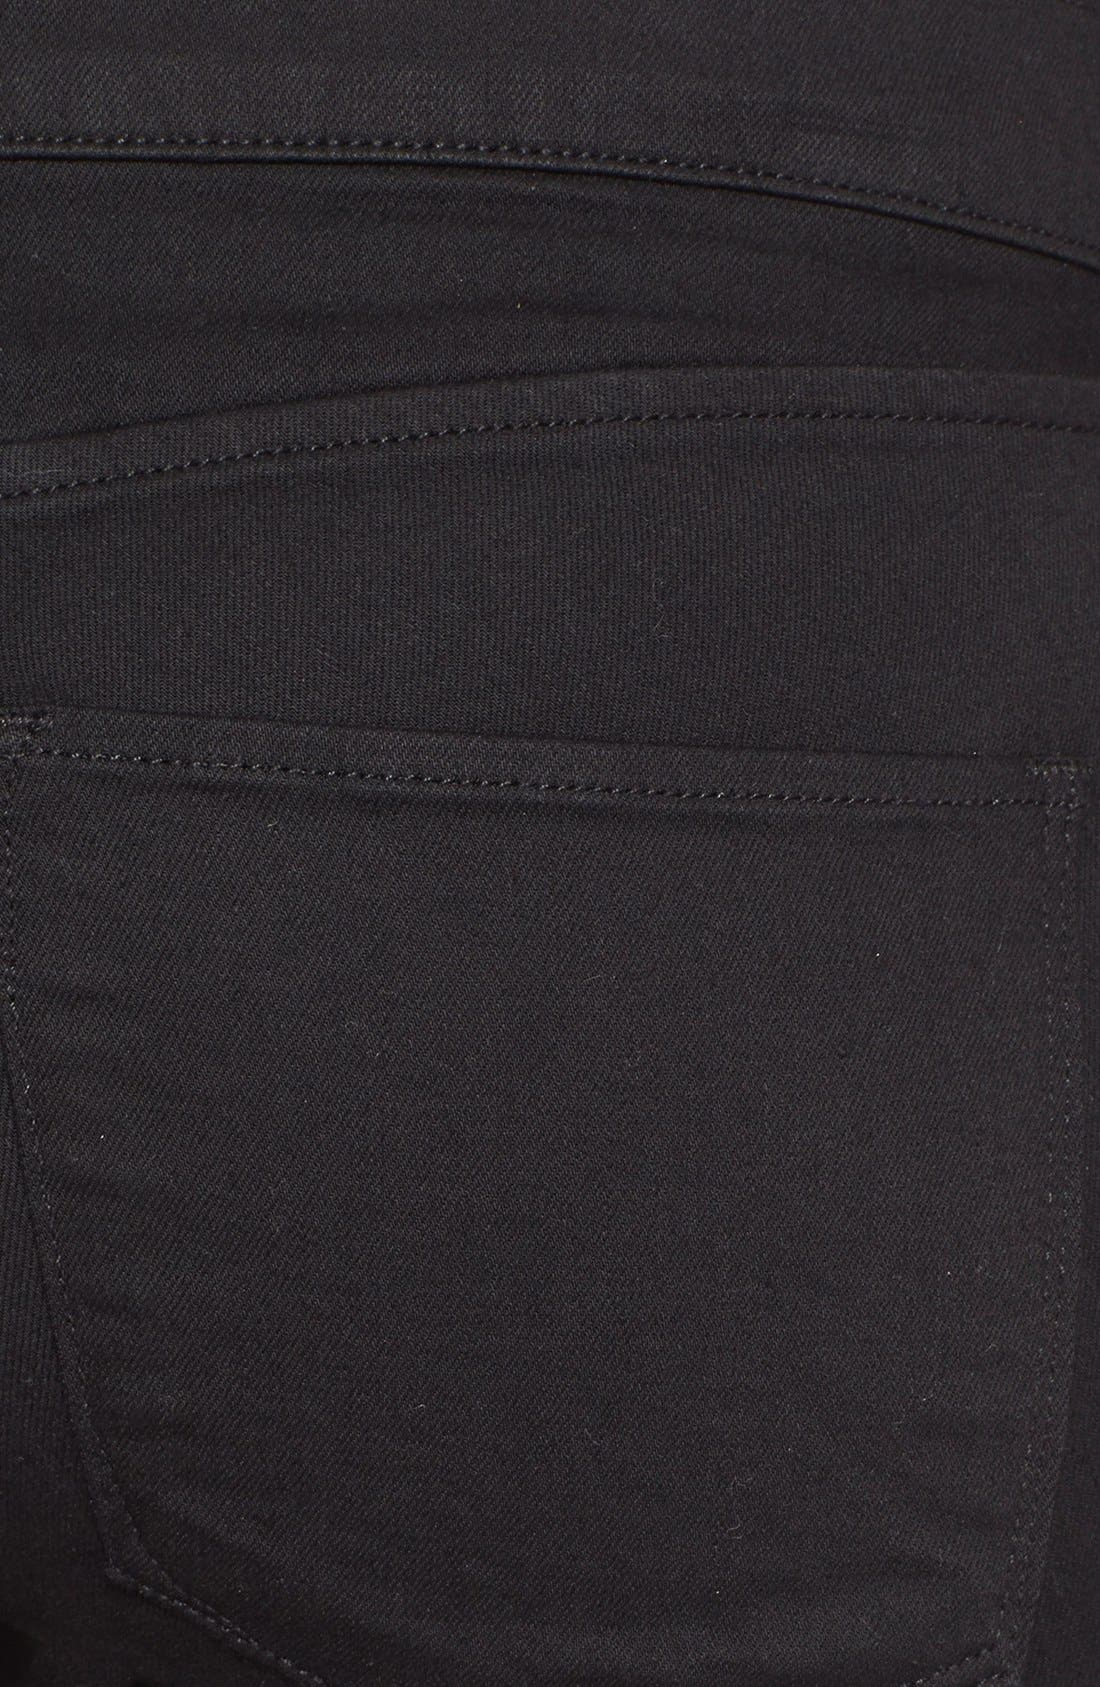 Alternate Image 3  - AYR 'The Skinny' Skinny Jeans (Jet Black)